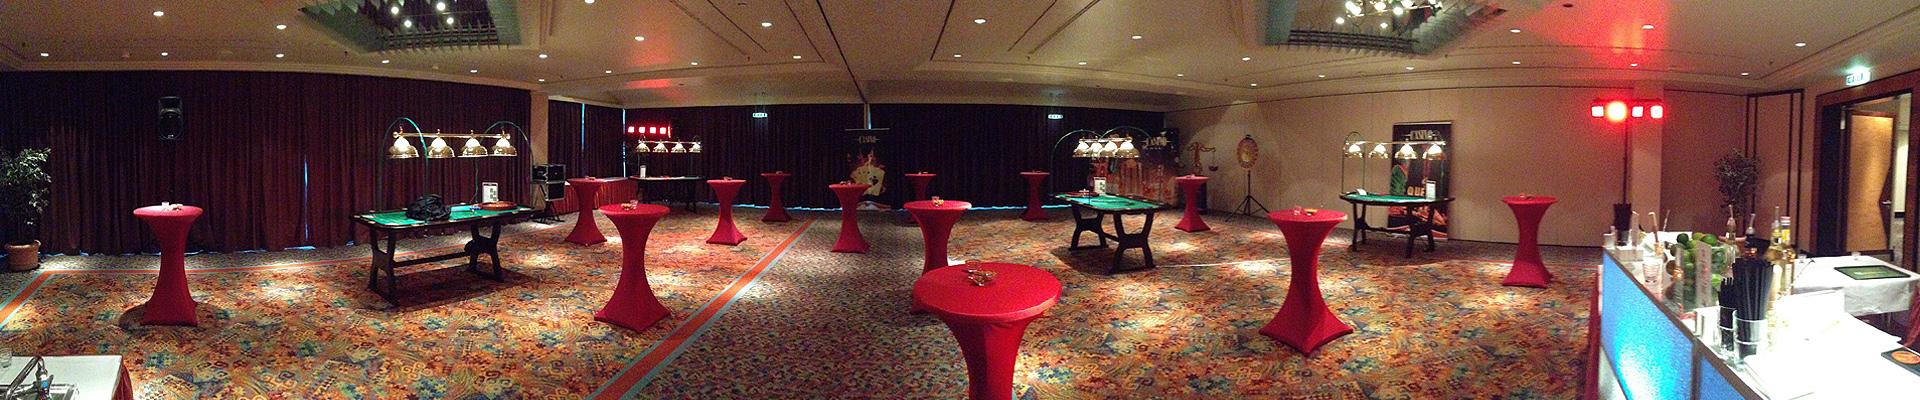 beste casinos las vegas